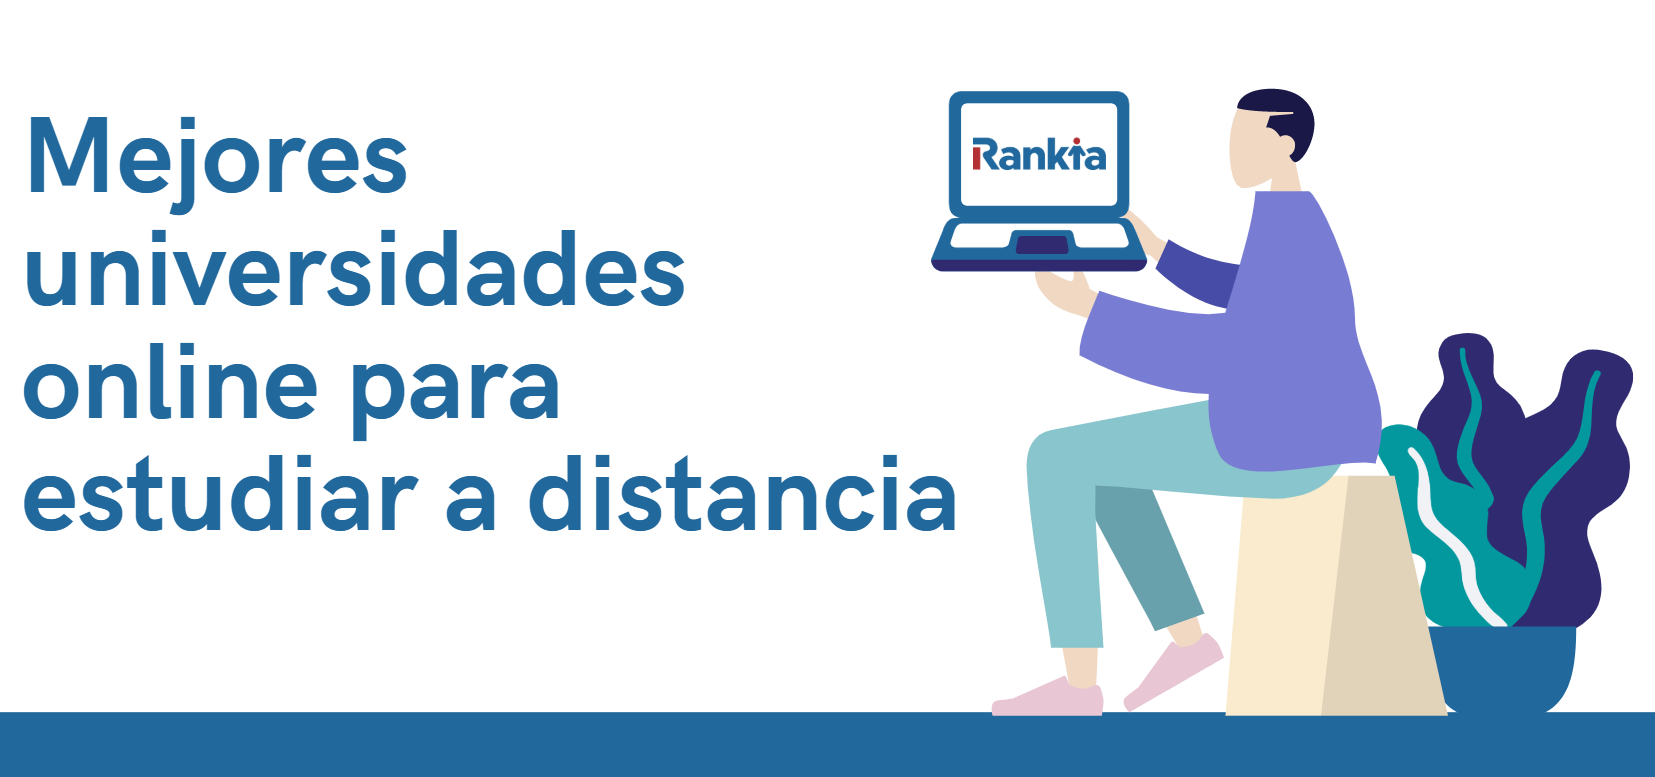 mejores universidades online para estudiar a distancia